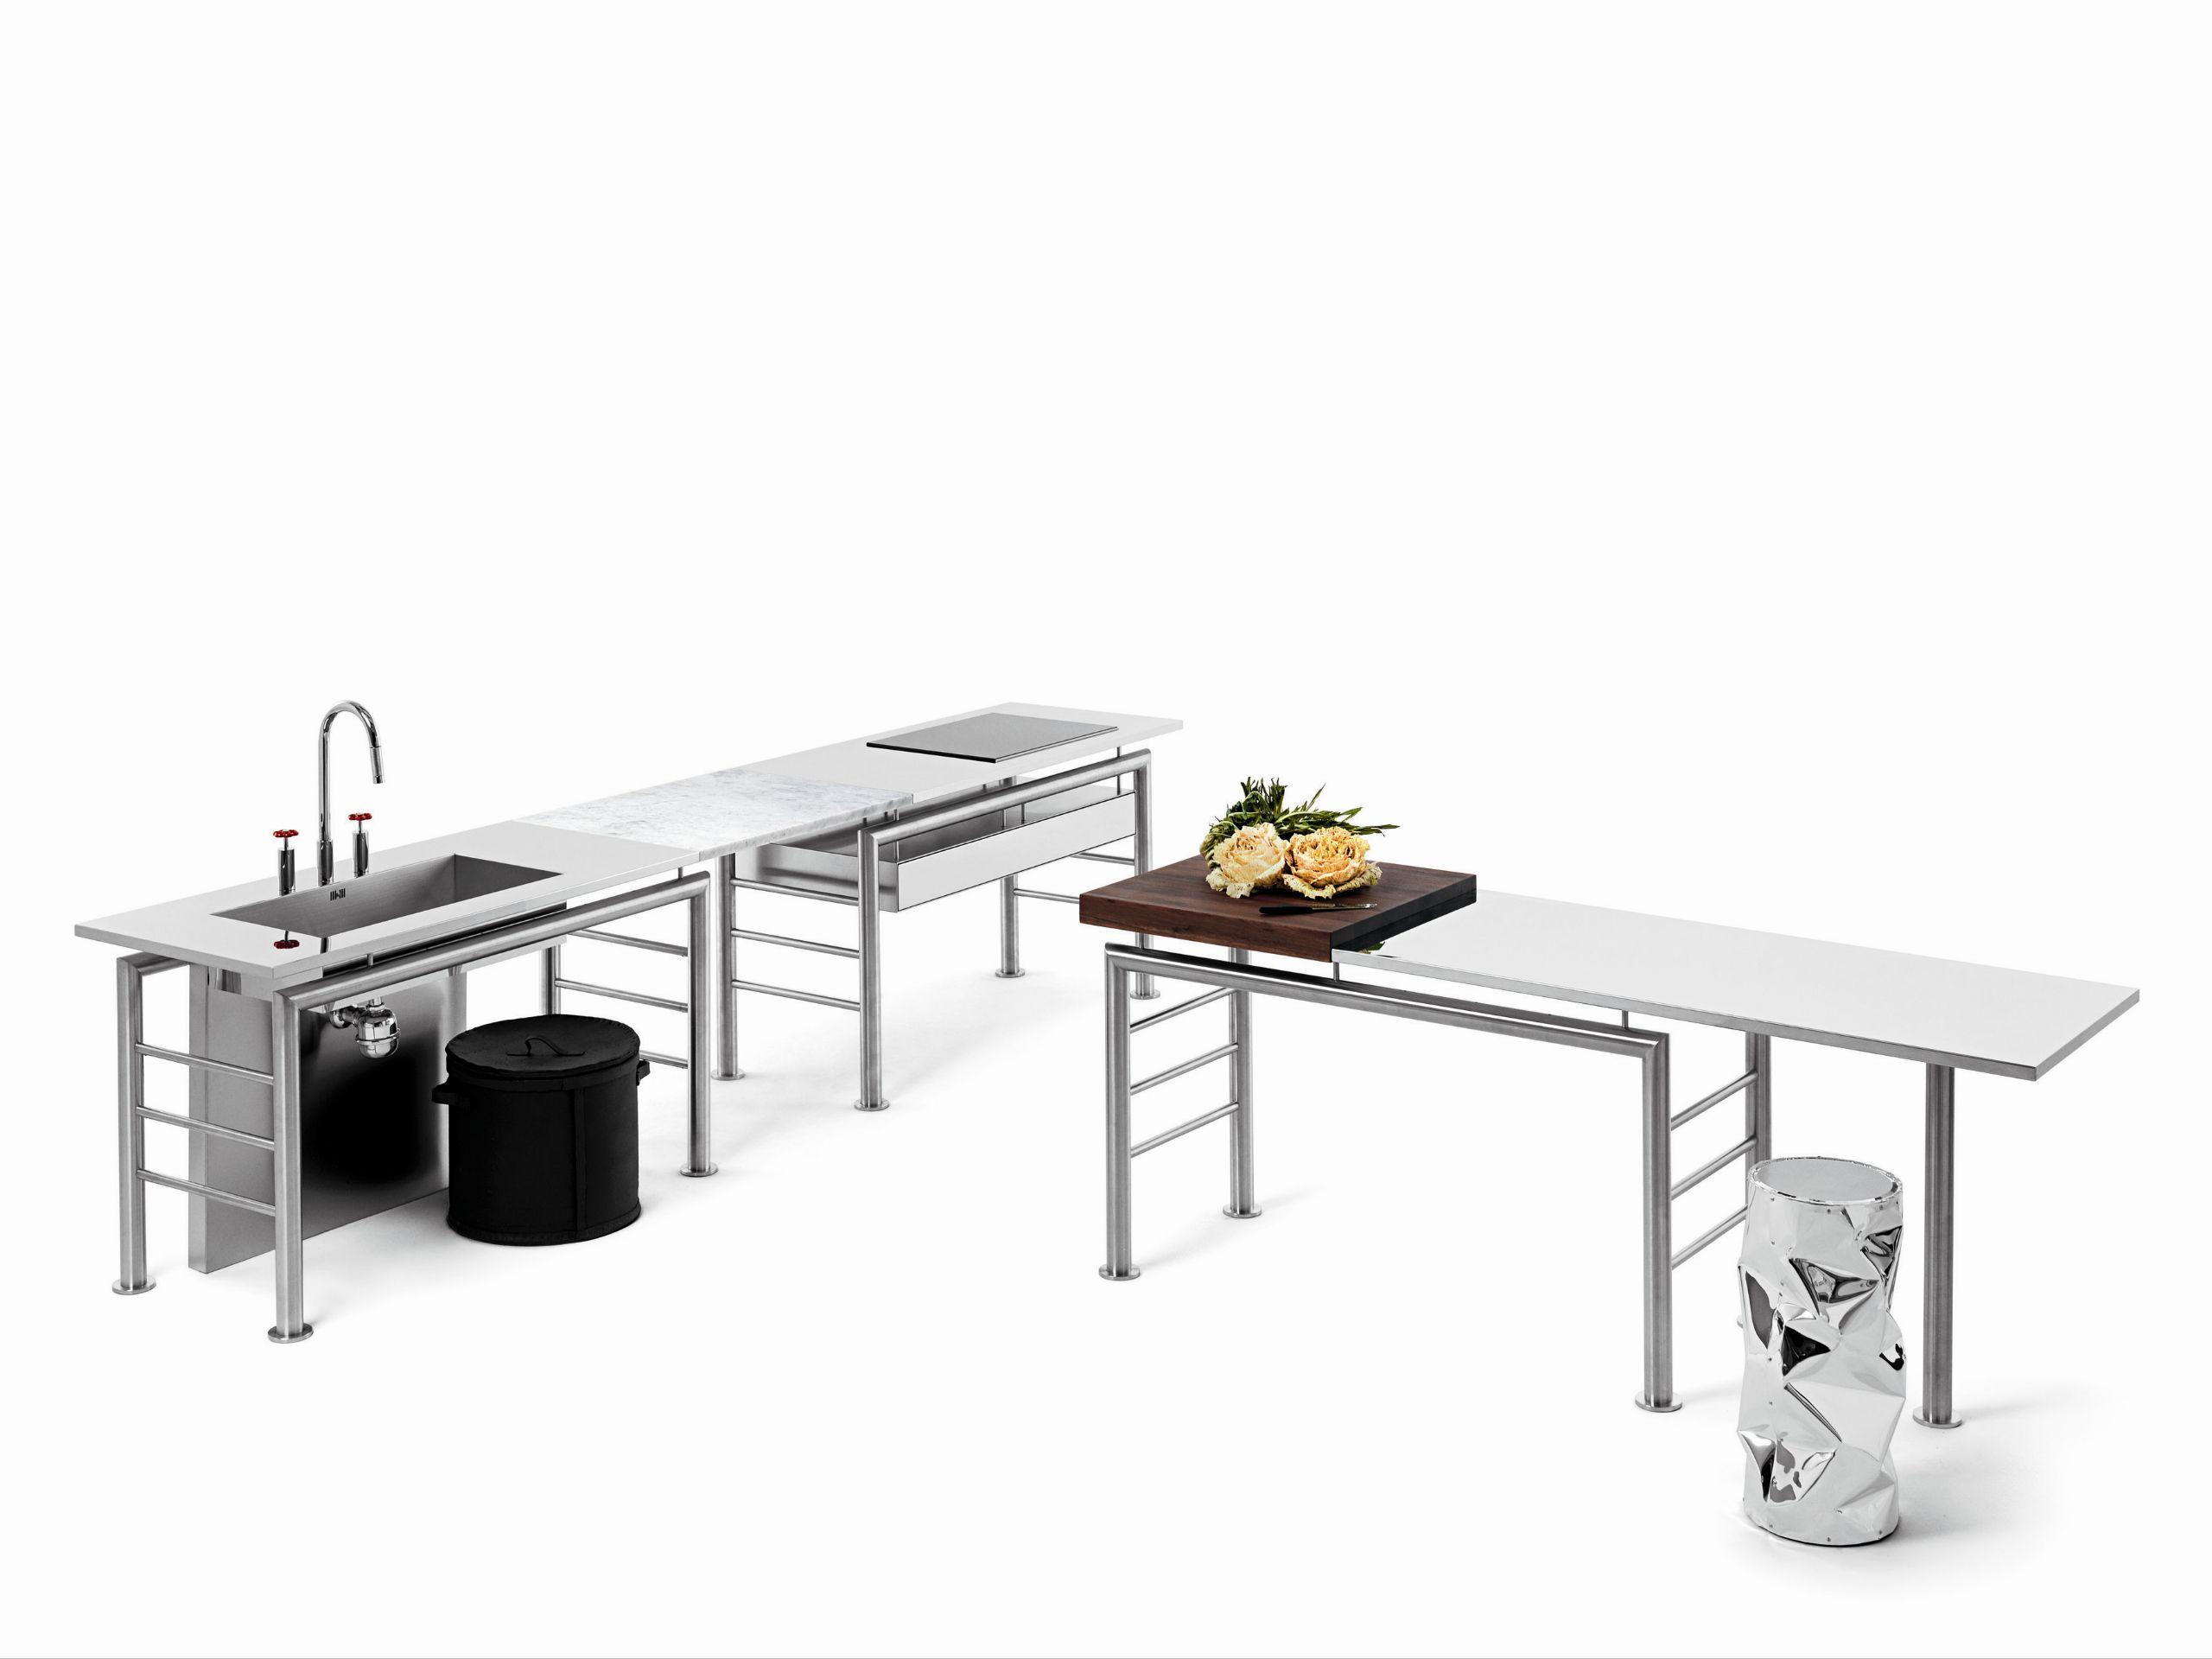 Cucina componibile modulare AXIS Ponte Collezione Axis by Opinion ...